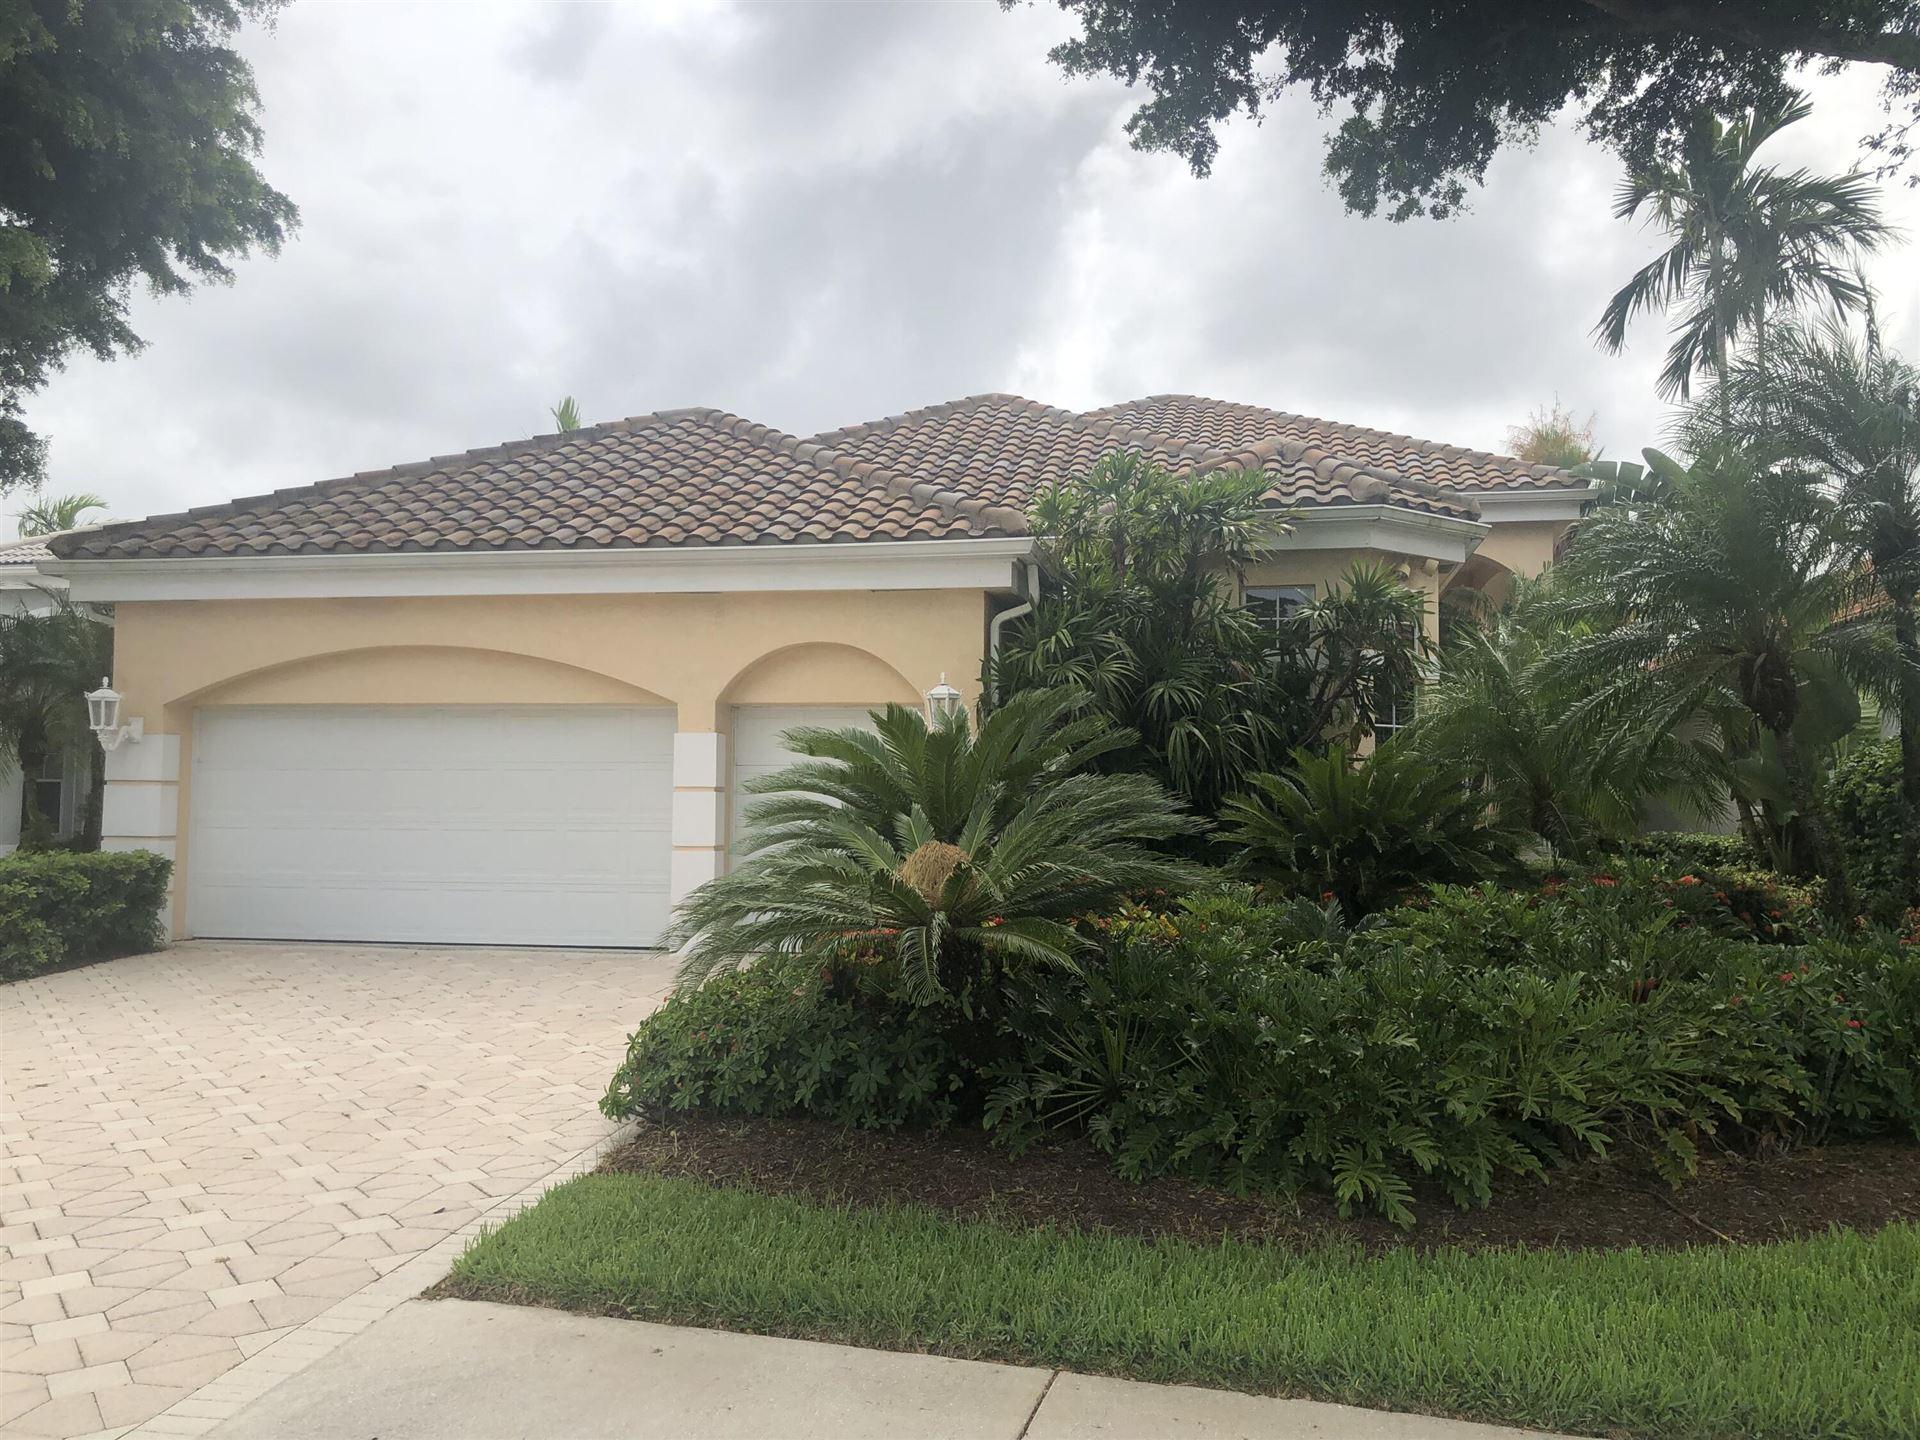 Photo of 149 Windward Drive, Palm Beach Gardens, FL 33418 (MLS # RX-10731106)